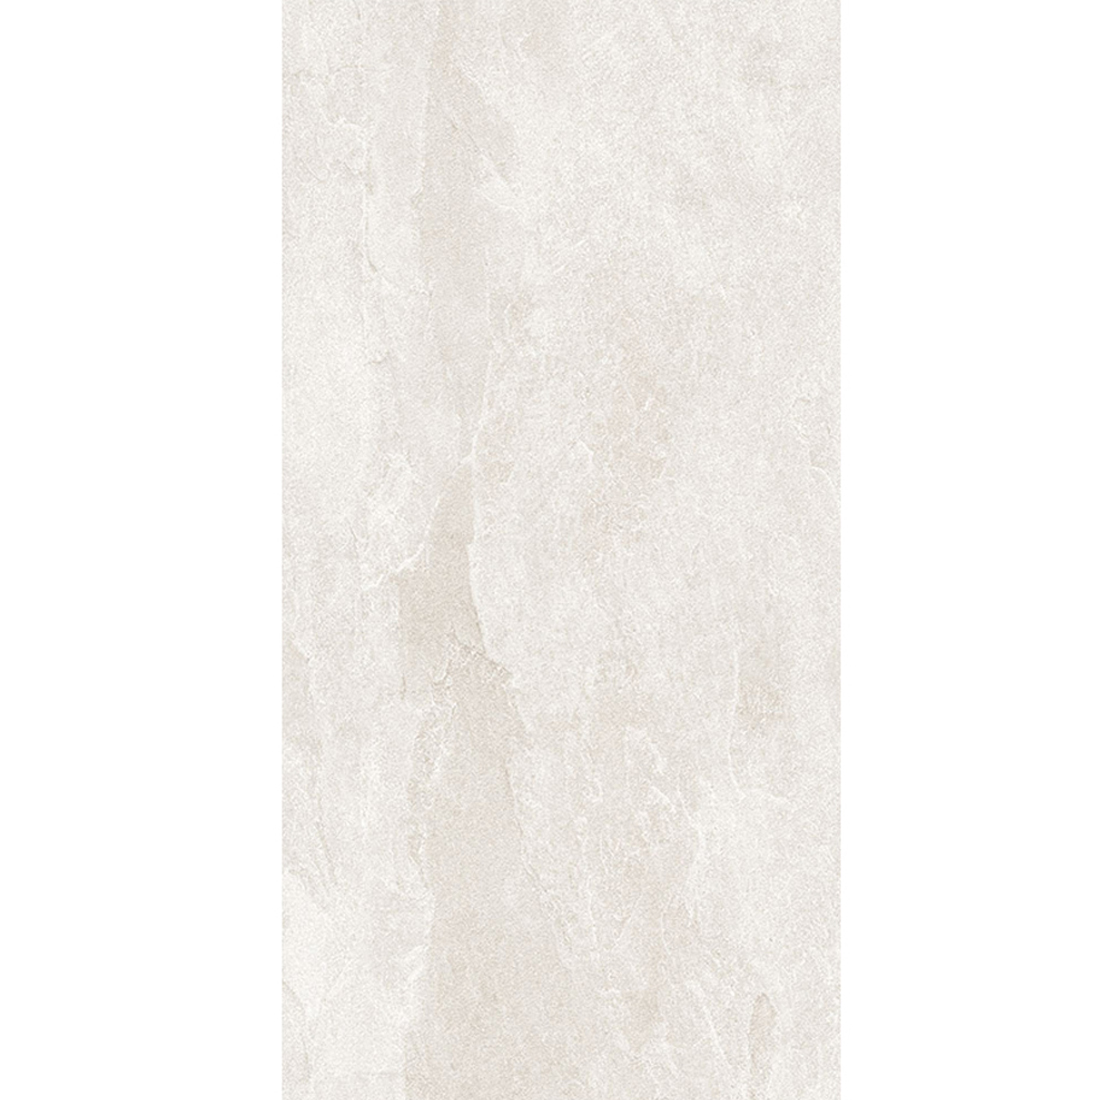 Nitco Nordic White N6901 Matte Glazed Vitrified Tile